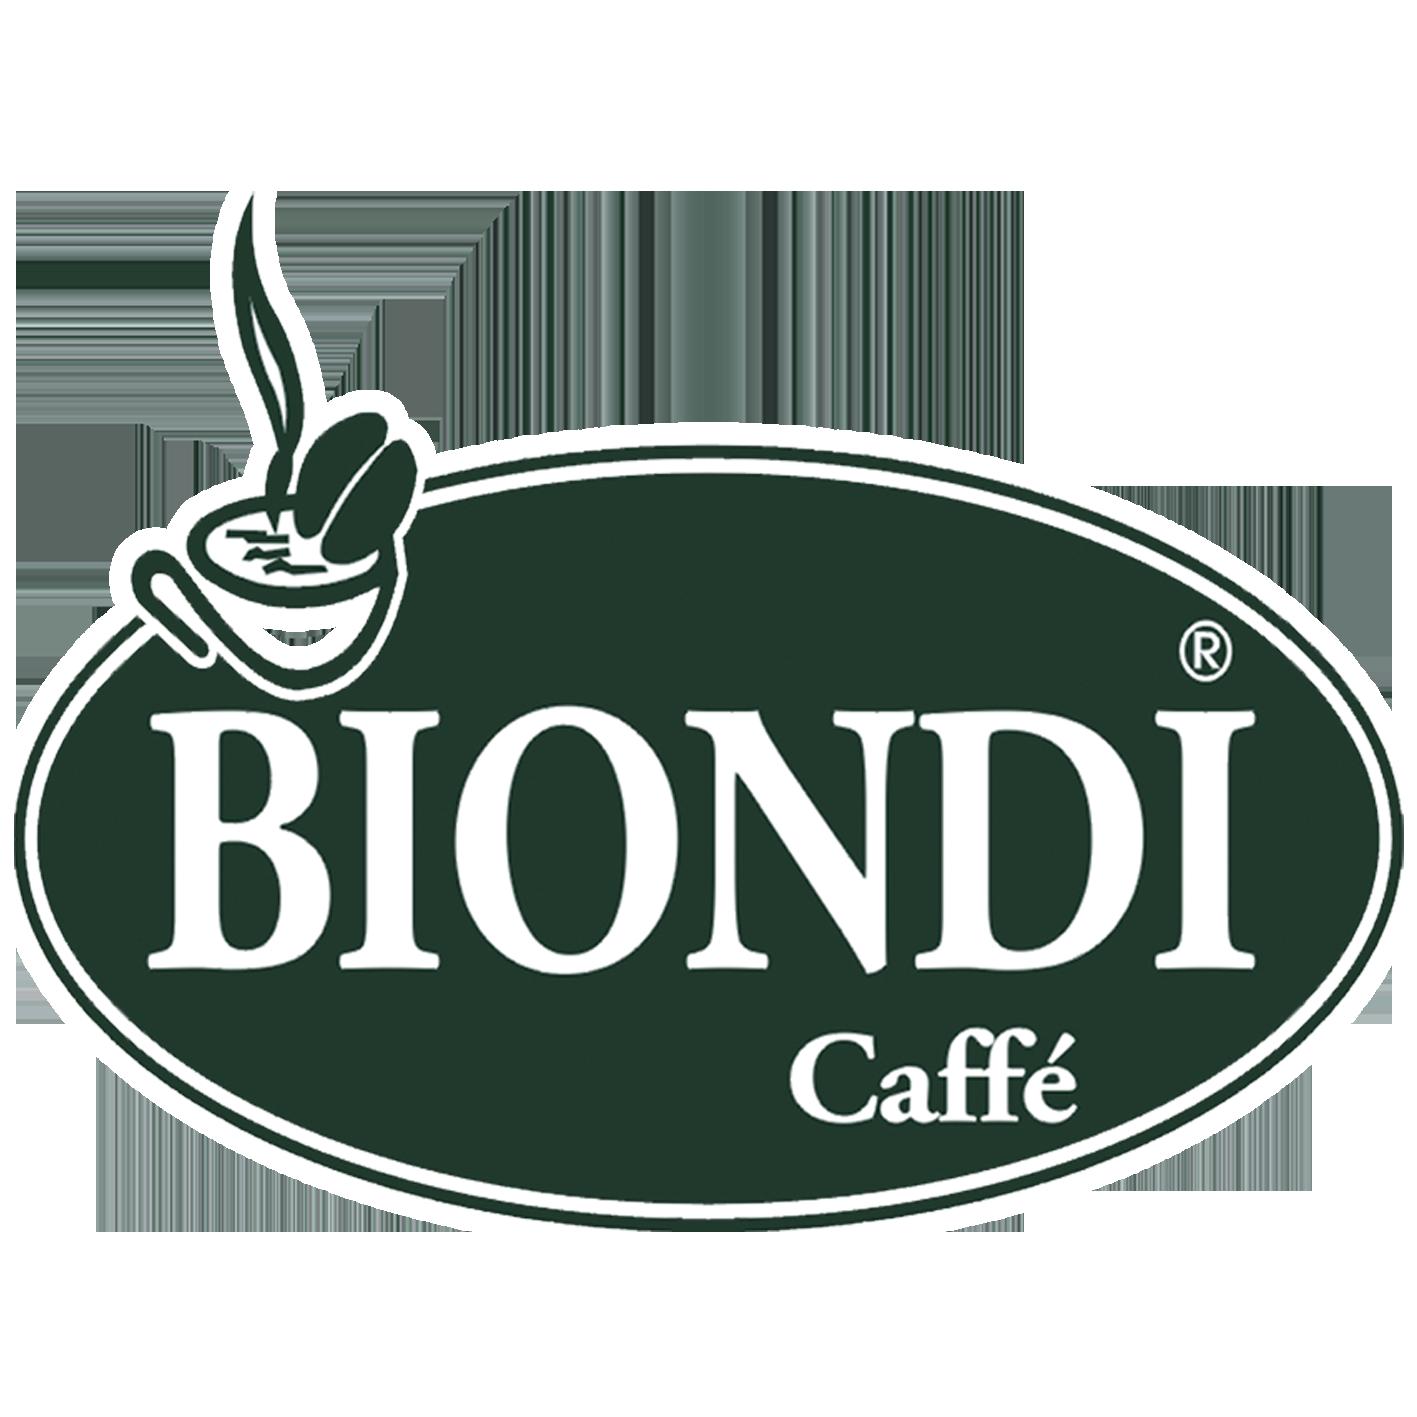 Caffe Biondi